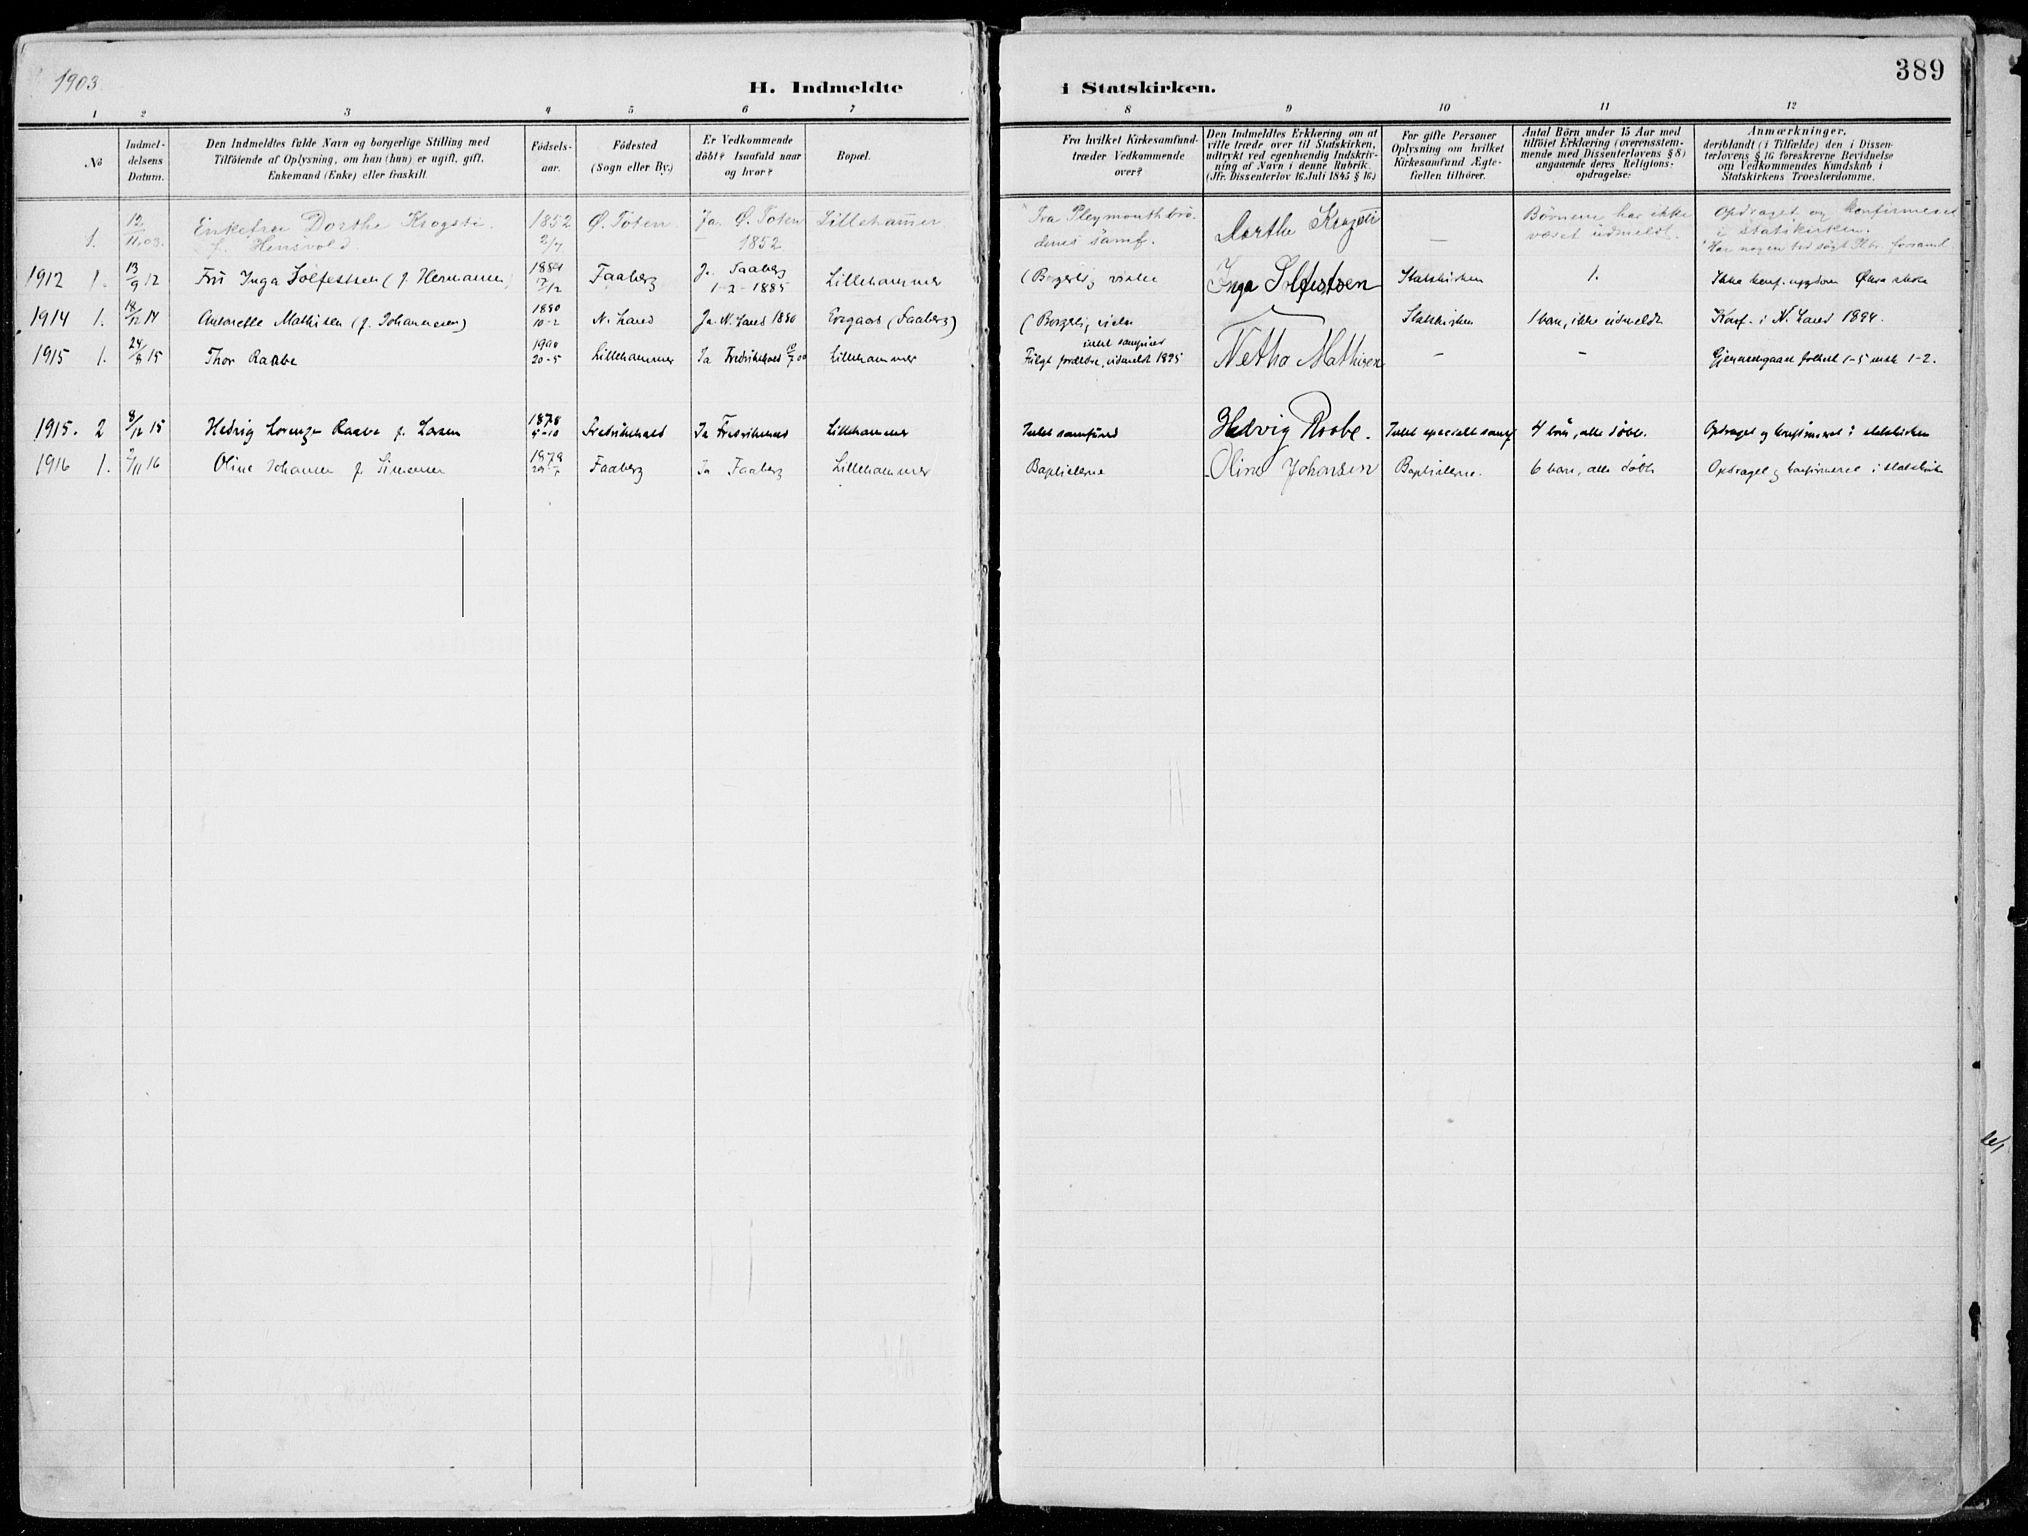 SAH, Lillehammer prestekontor, Ministerialbok nr. 1, 1901-1916, s. 389